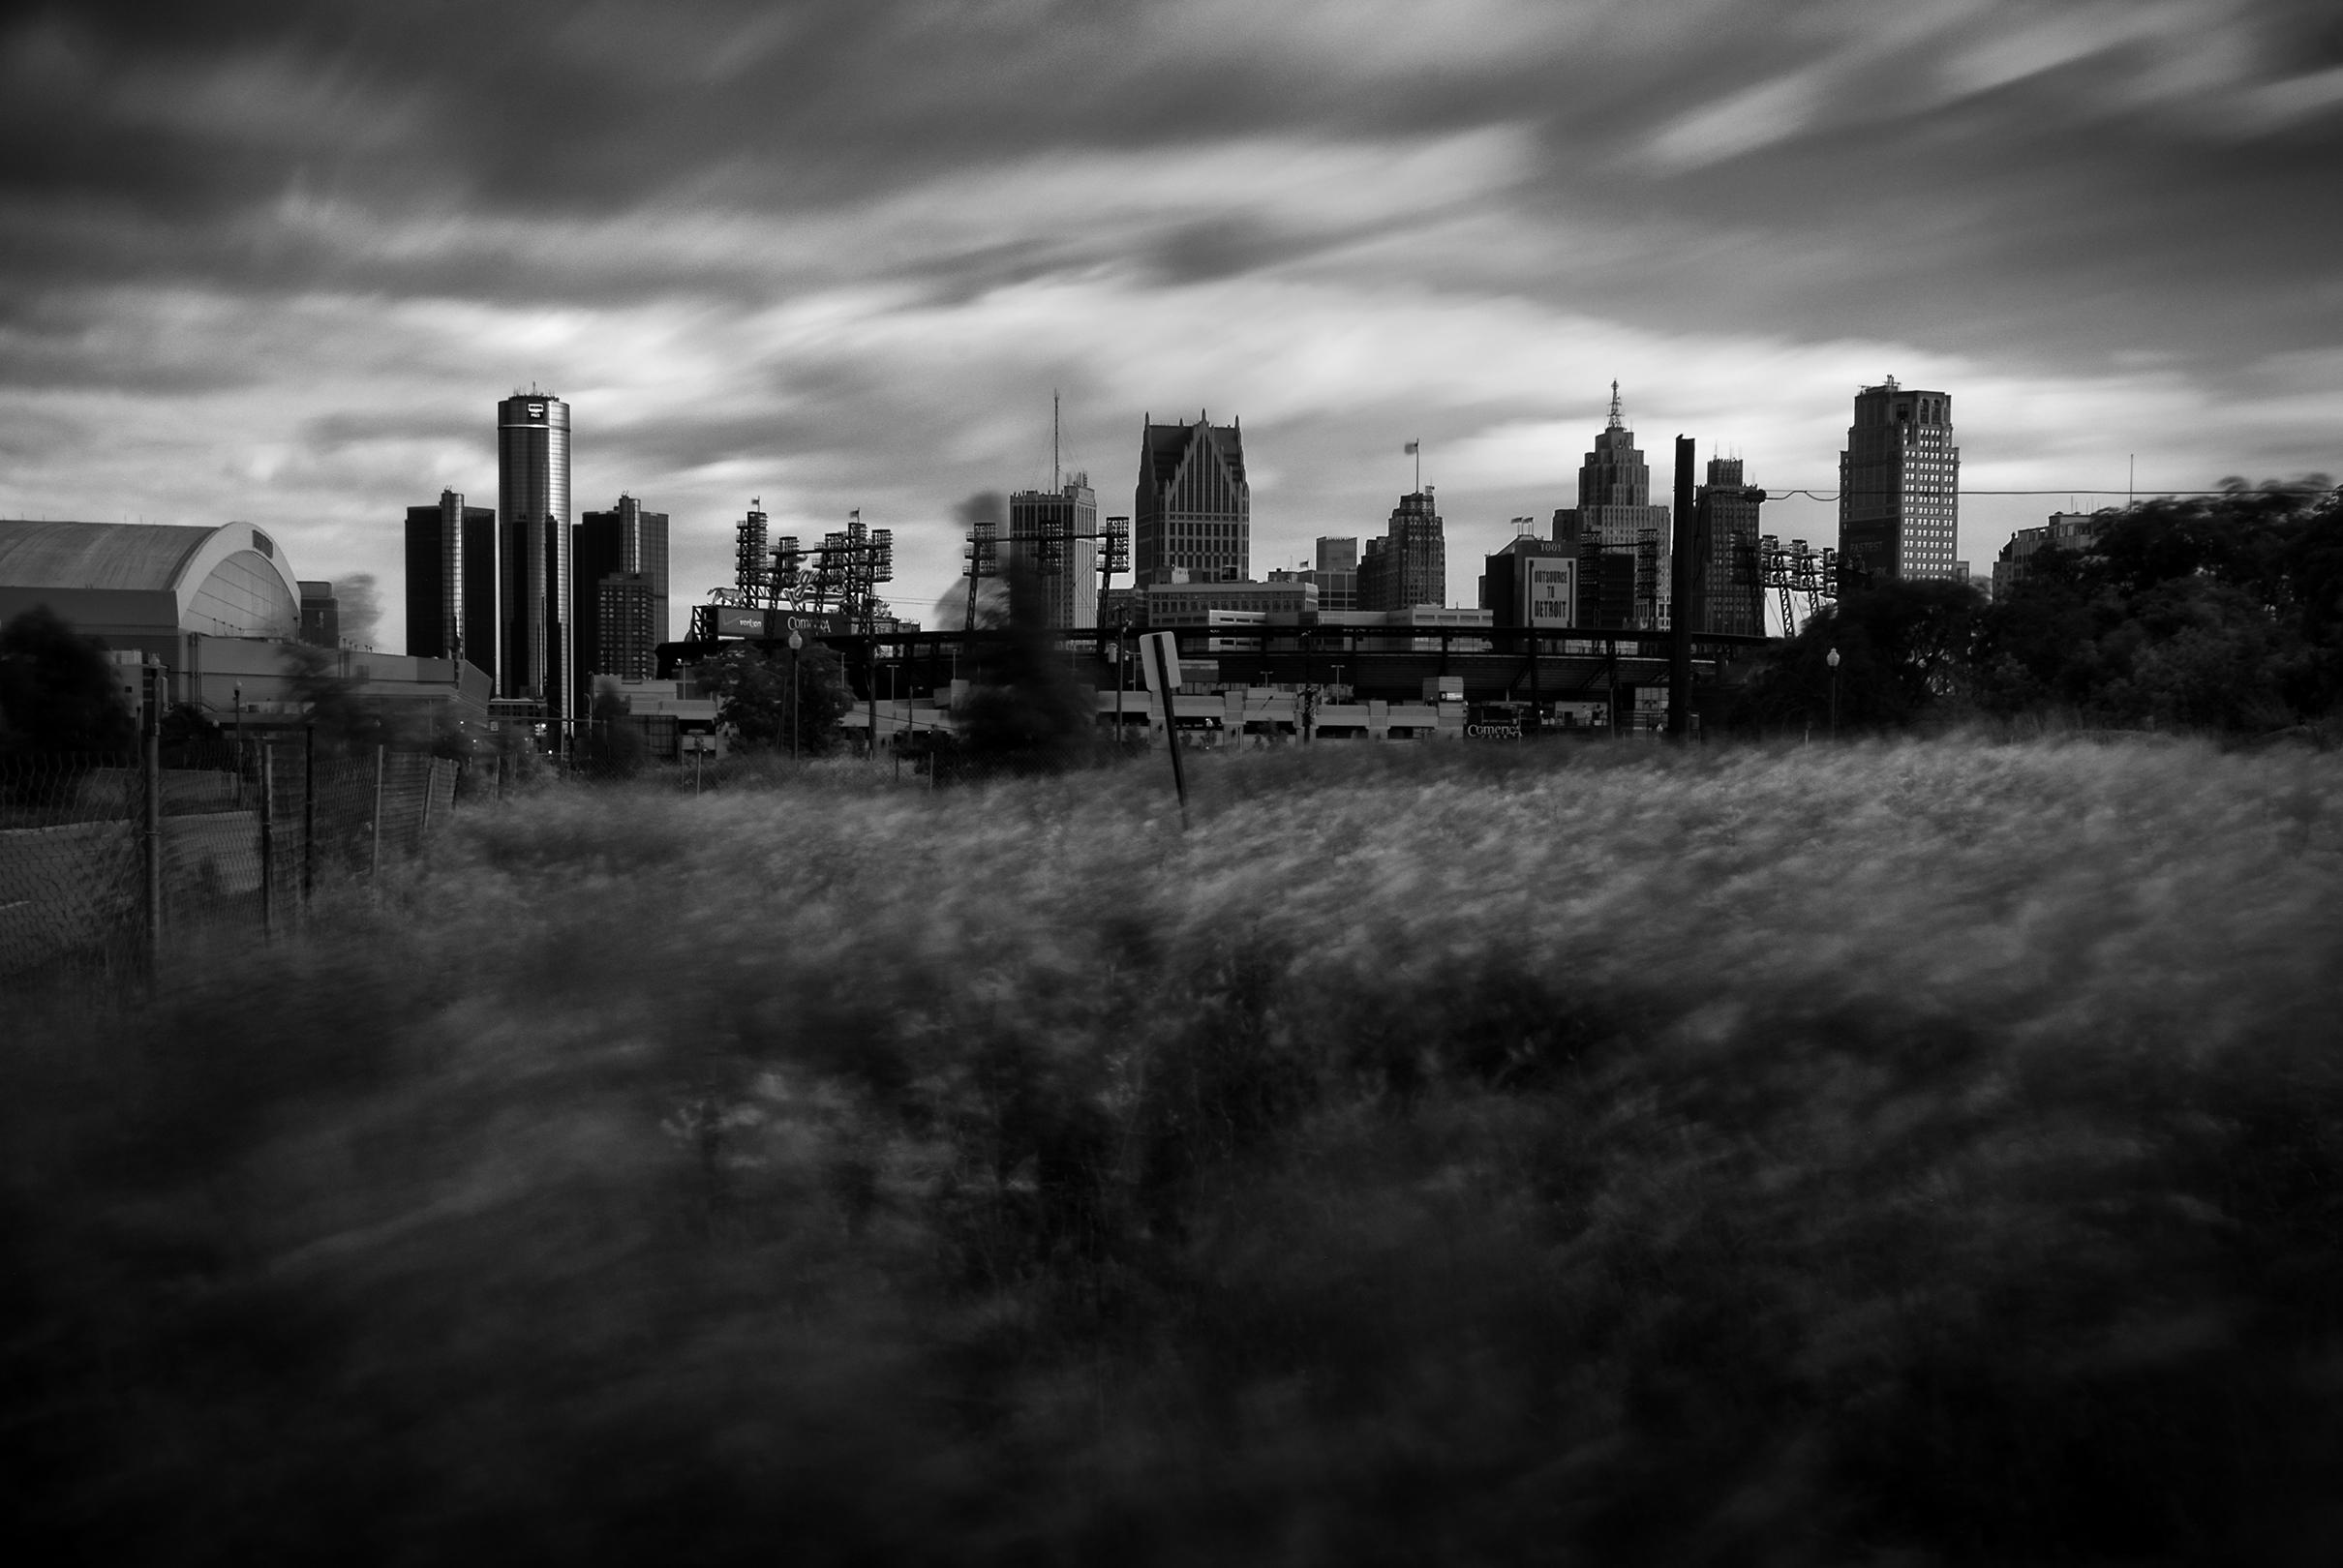 Brushed Detroit, 2012